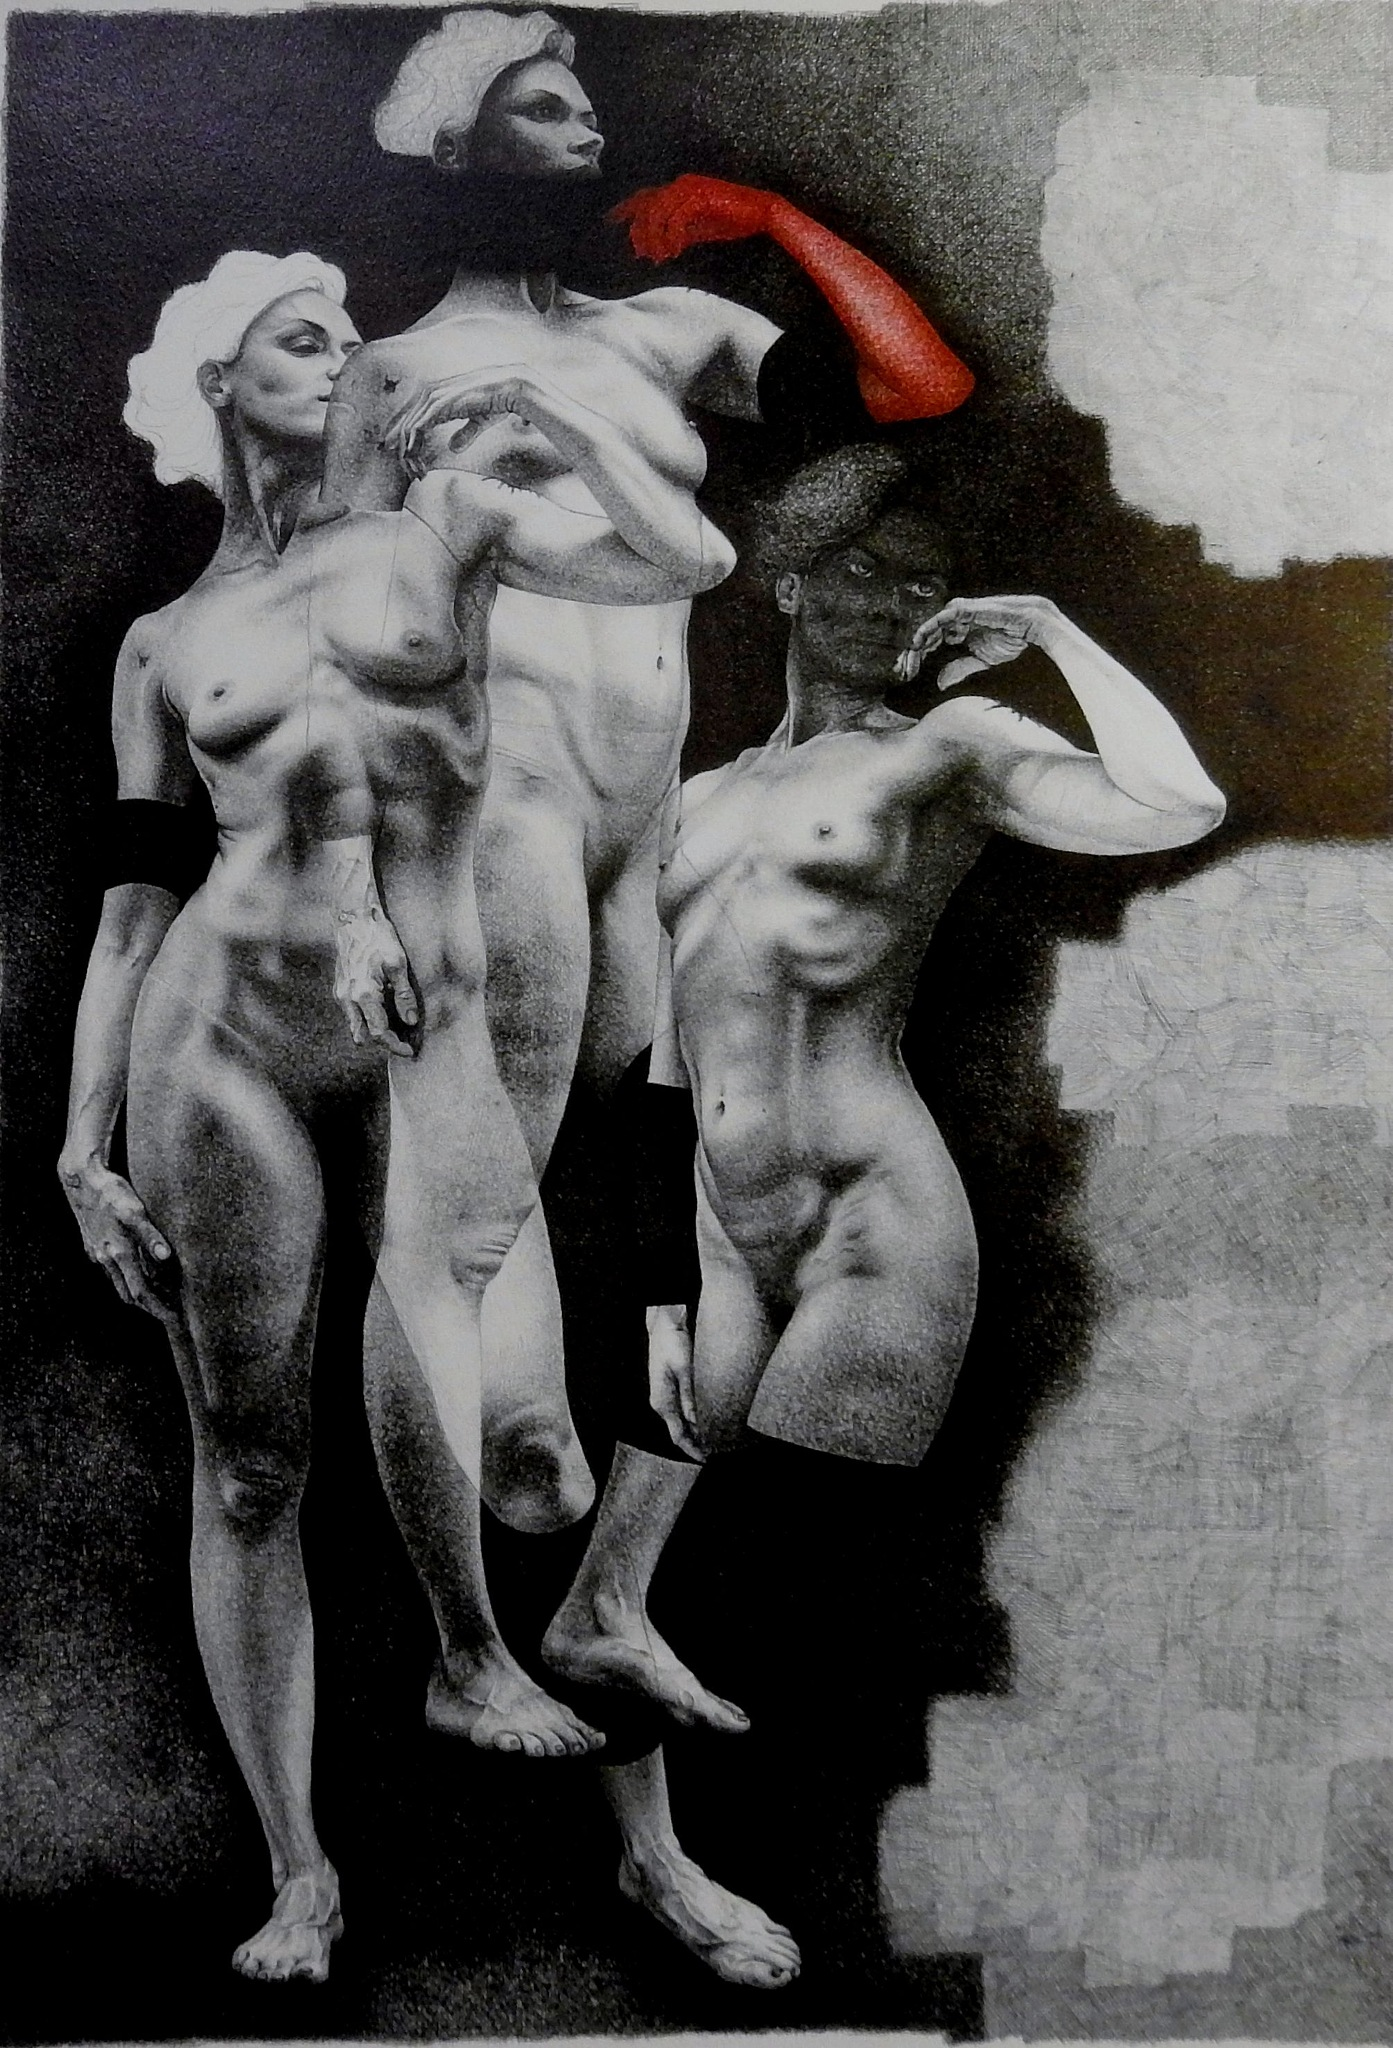 P.A.N. Napoli Adele Ceraudo - Il David by Arnaldo De Lisio